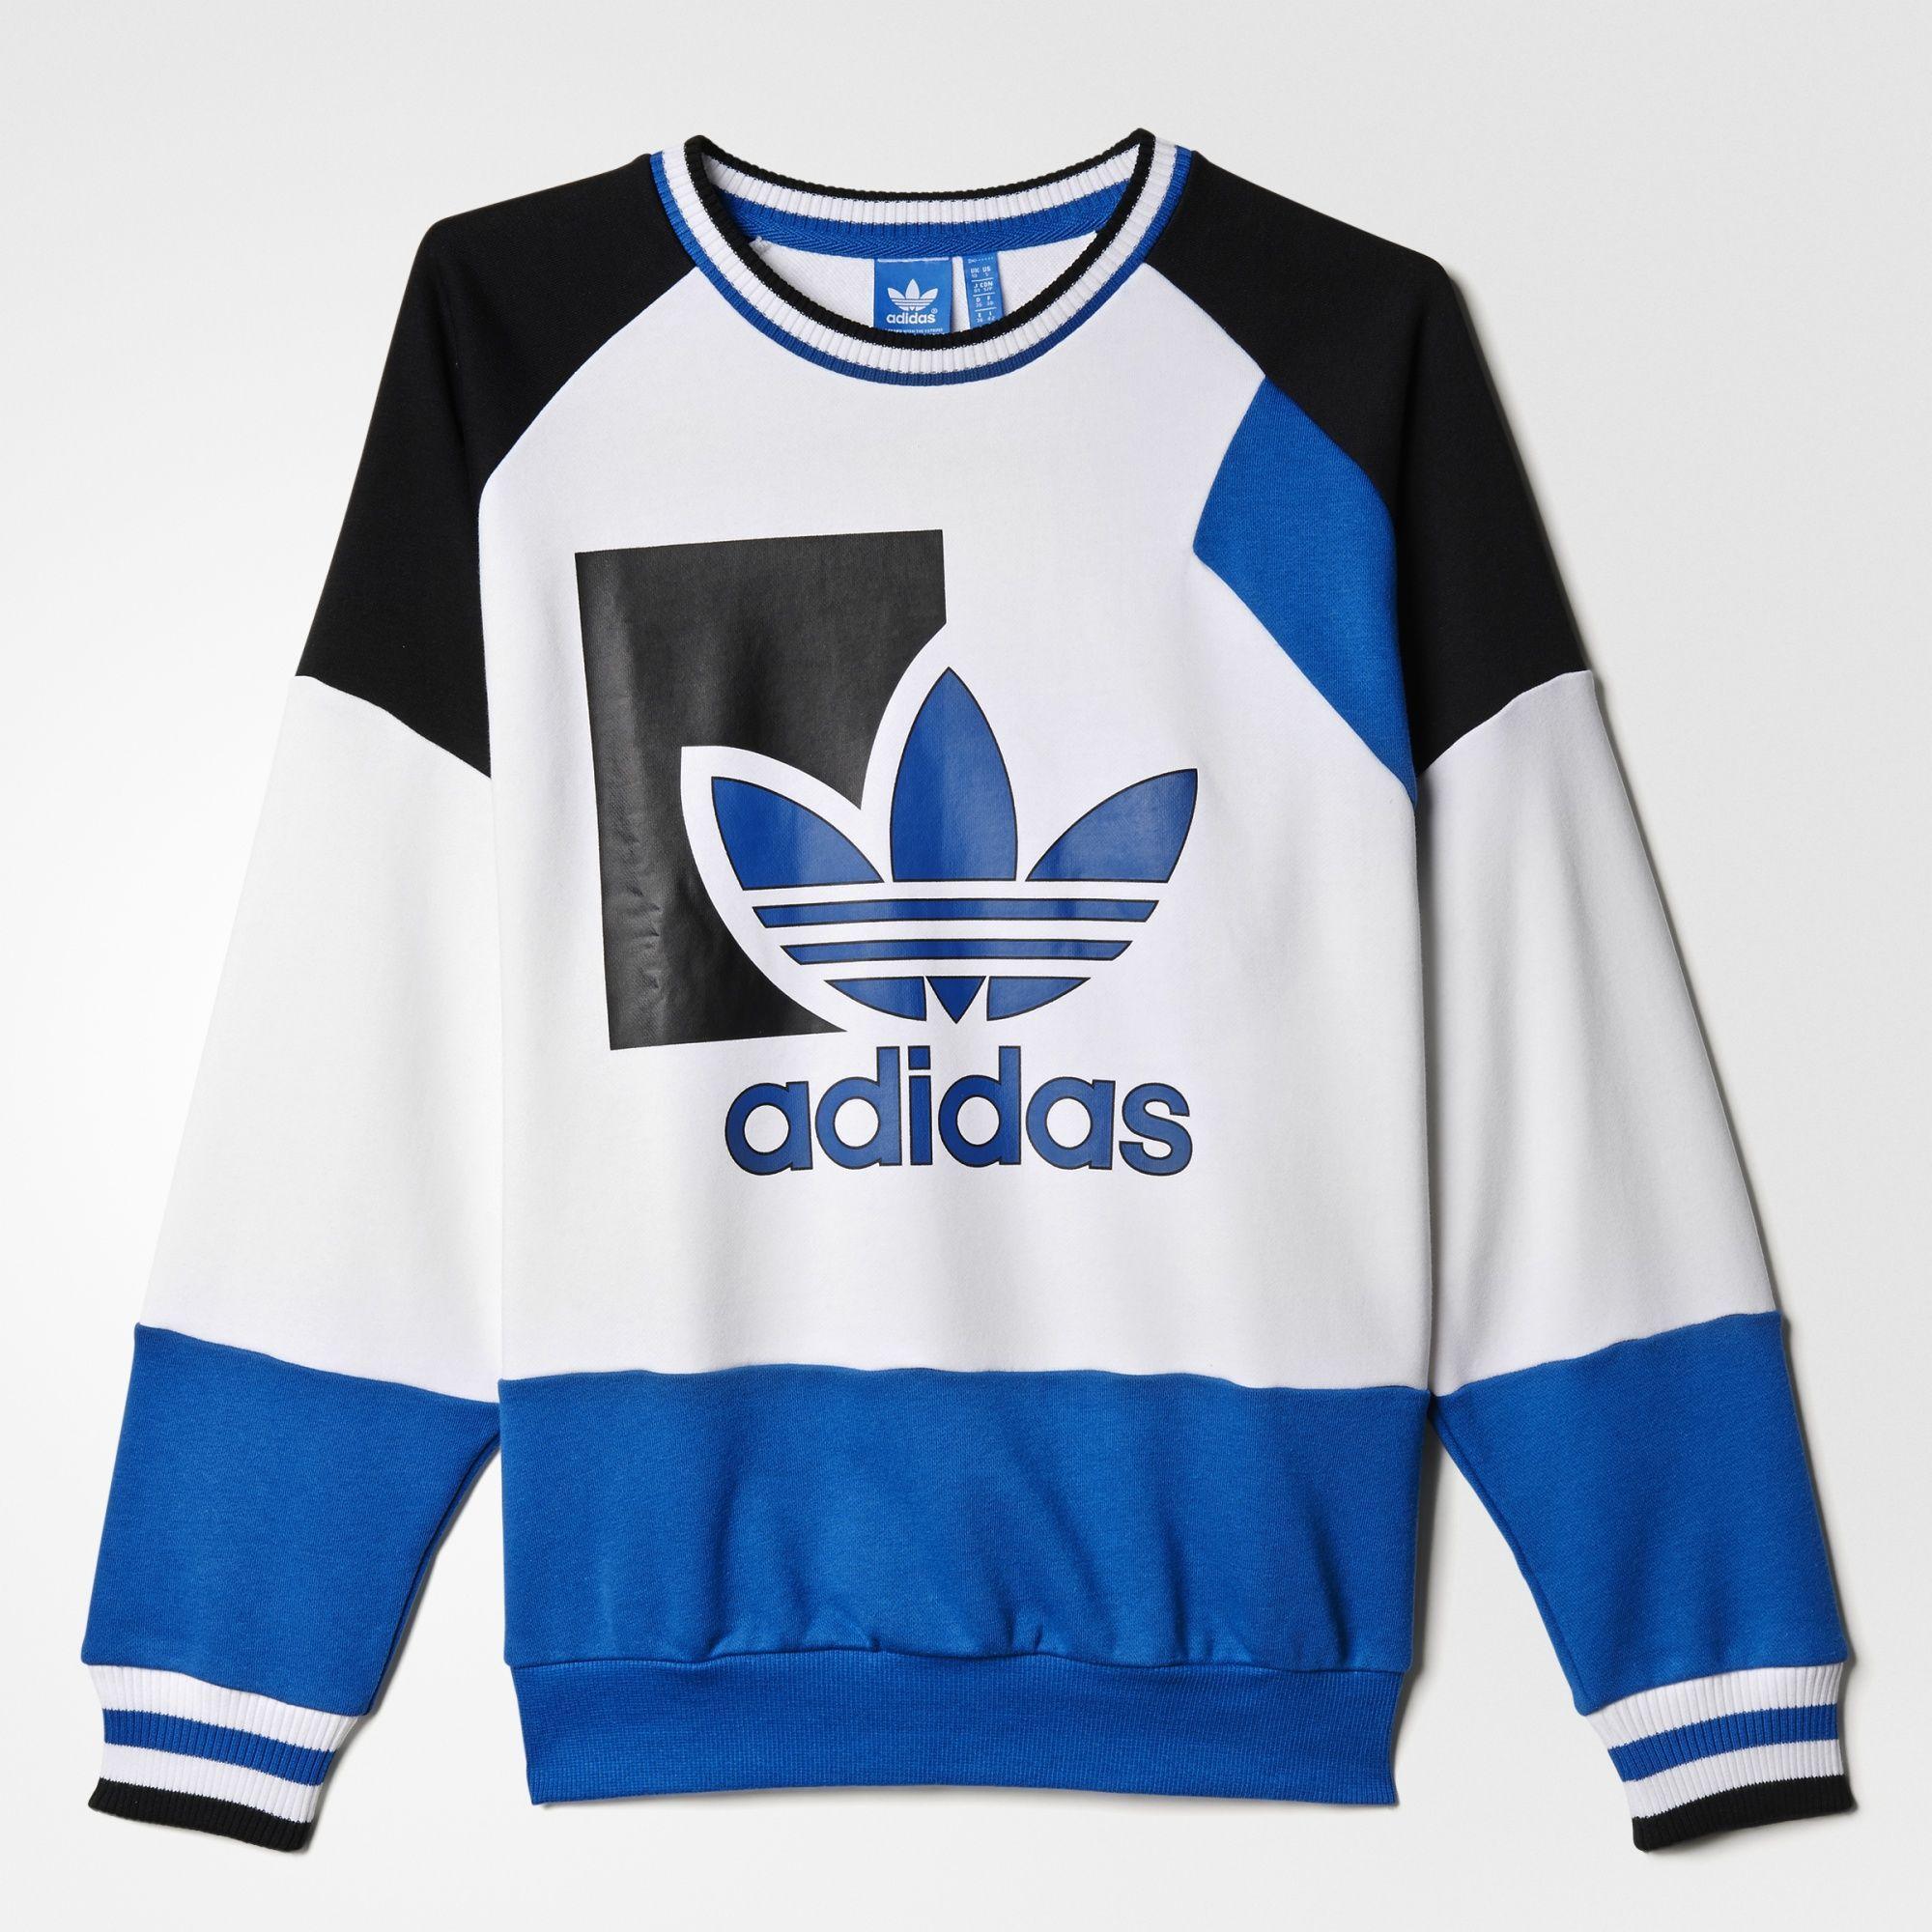 Adidas Originals Running Baggy Sweater | Clothing | Pinterest ...